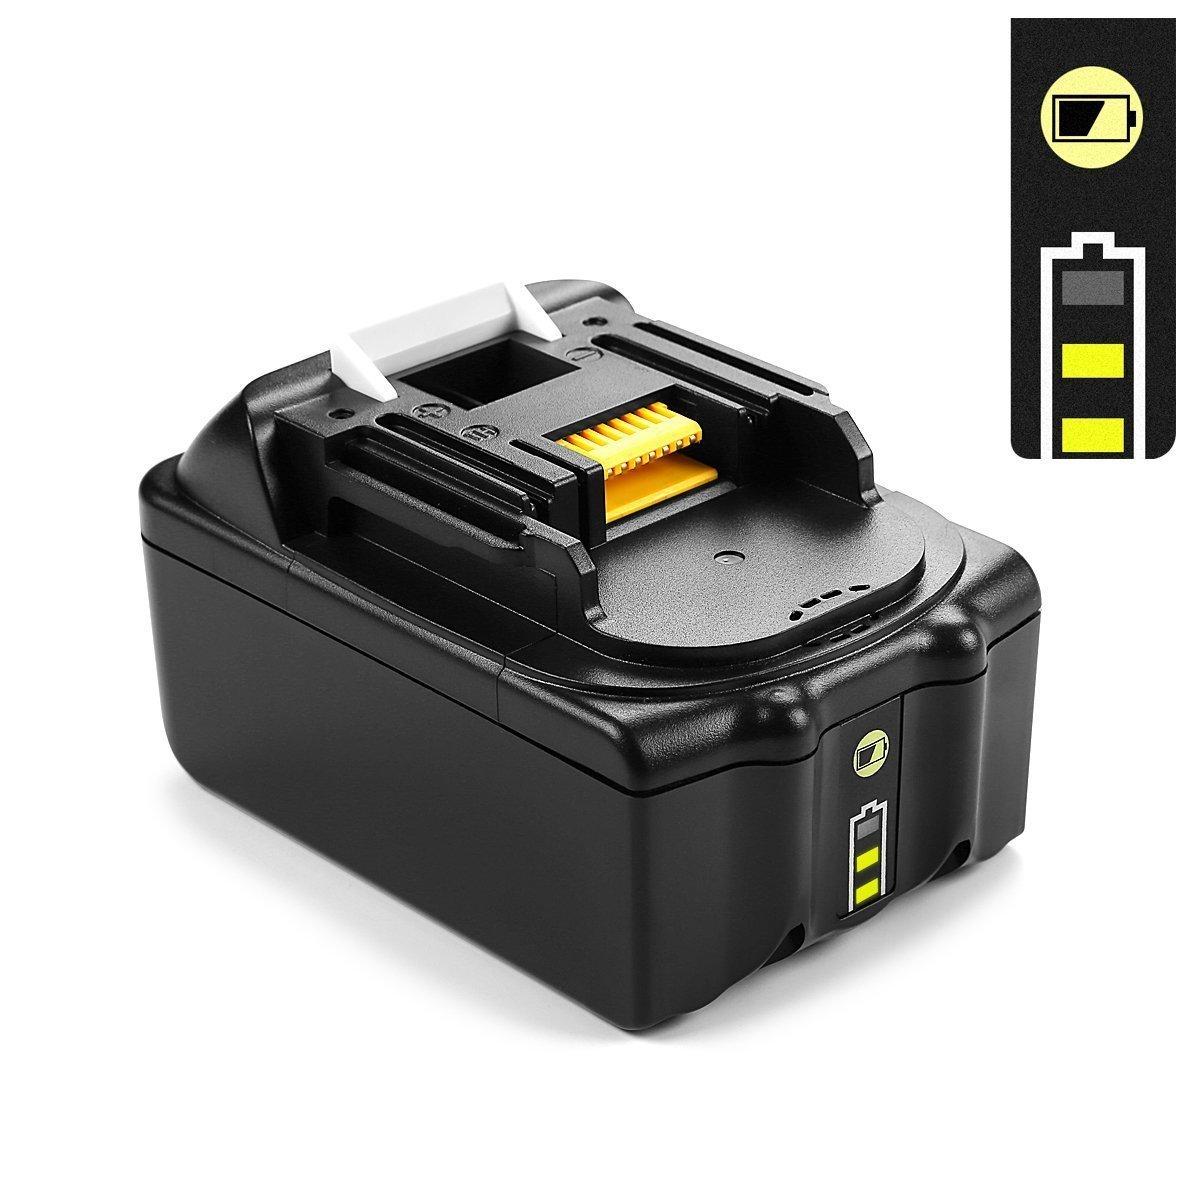 2x 18V 5.0Ah Reemplazo BL1850B Batería y cargador DC18RA para ...